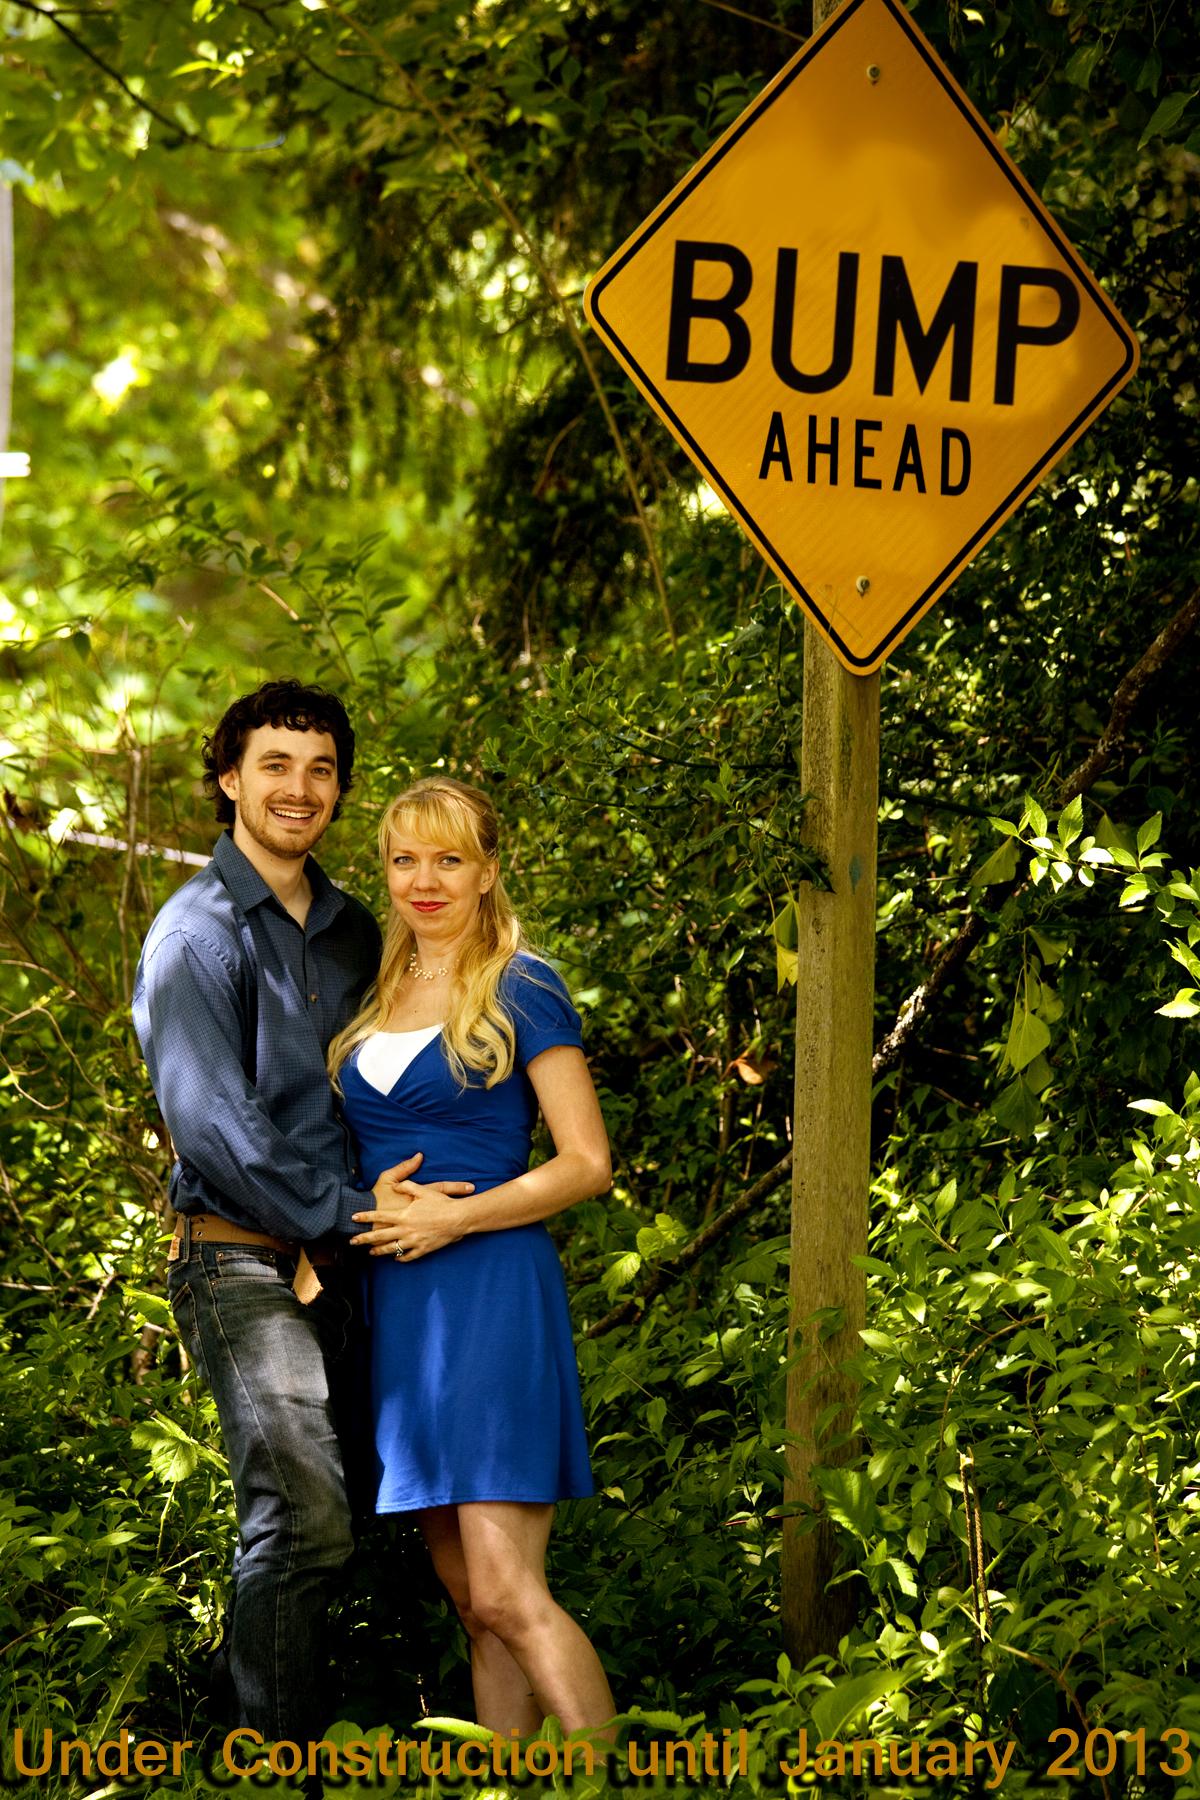 bump-ahead-sign